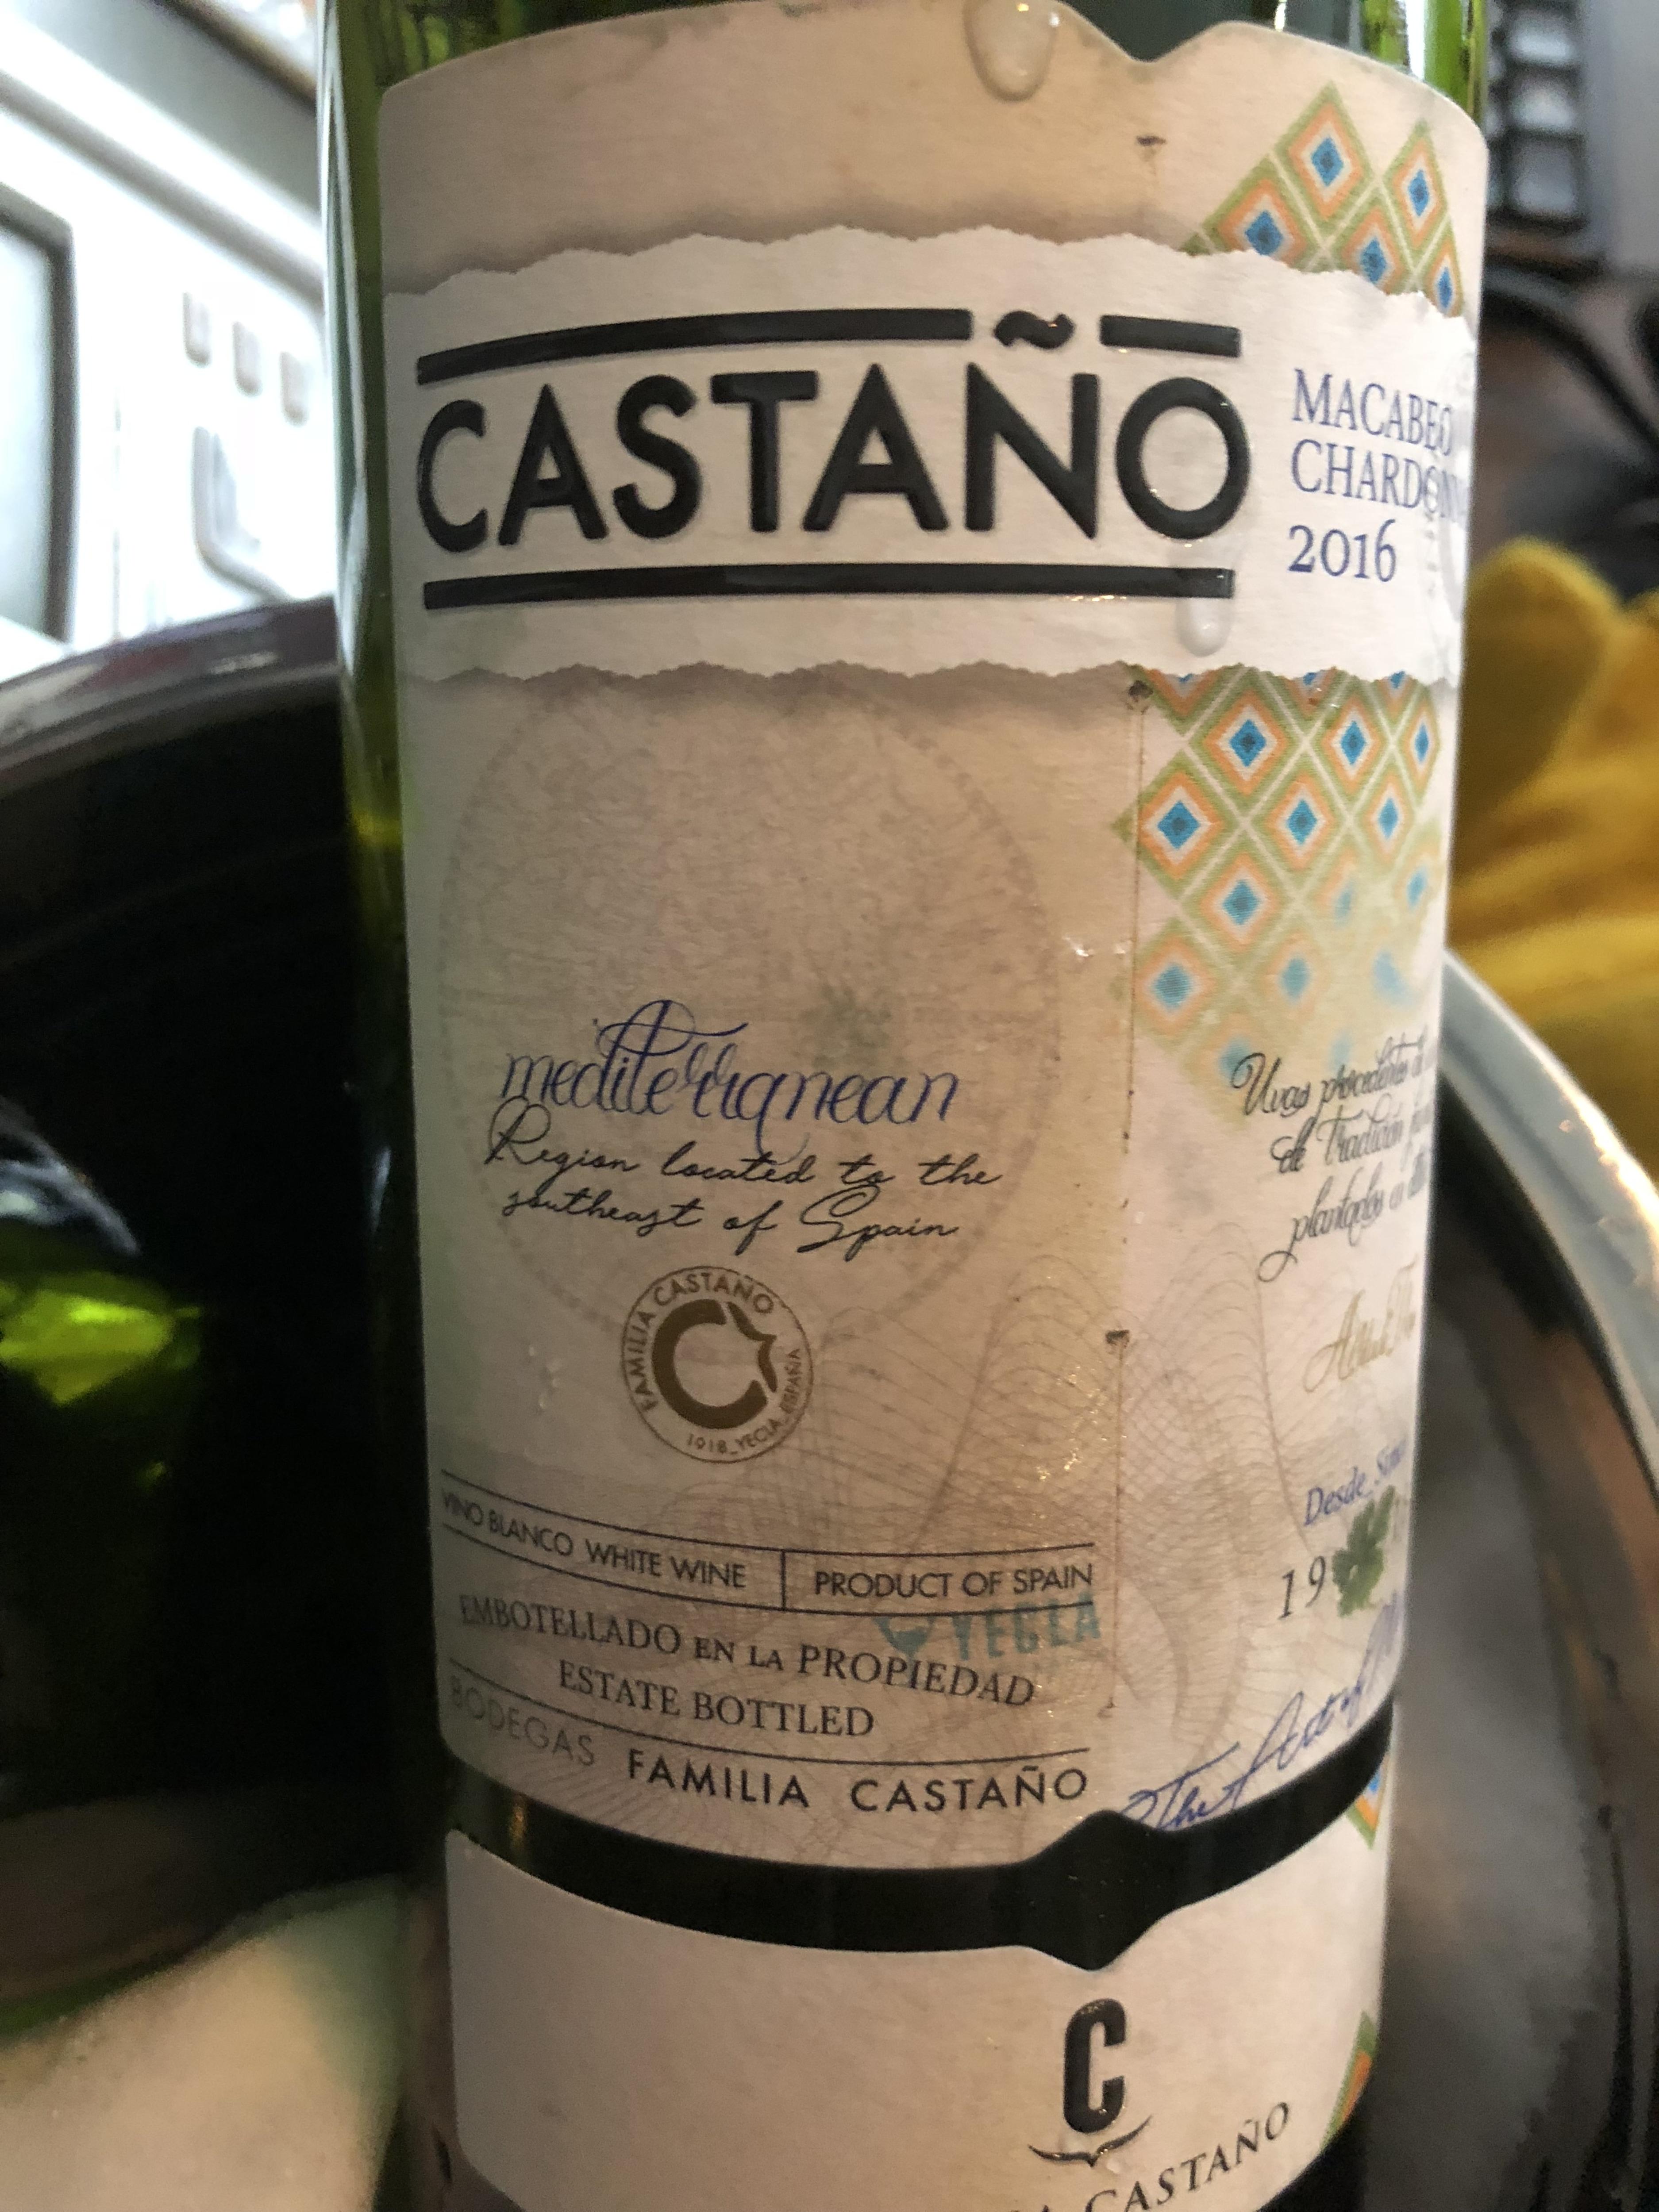 Castano Chardonnay / Maccabeo 2016, Code SAQ :  10855758, 14,40$